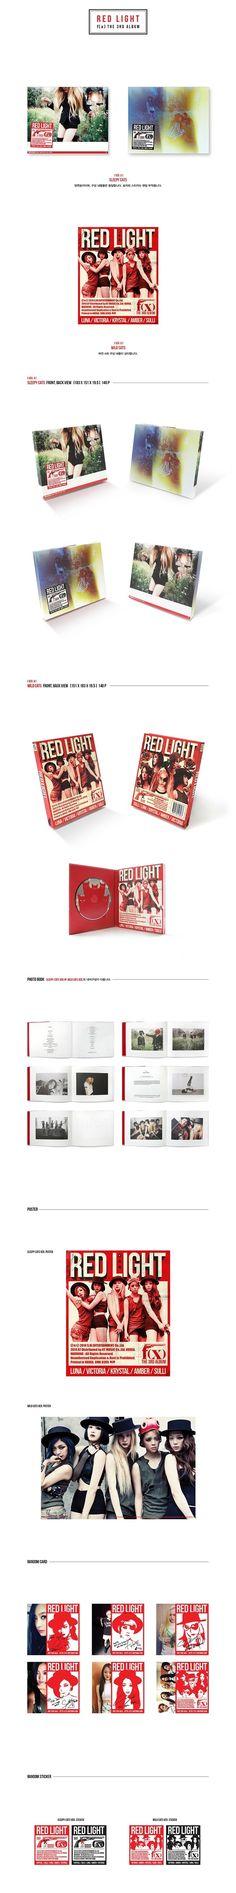 "f(x) The 3rd Album ""RED LIGHT"" | Music Album Packaging"